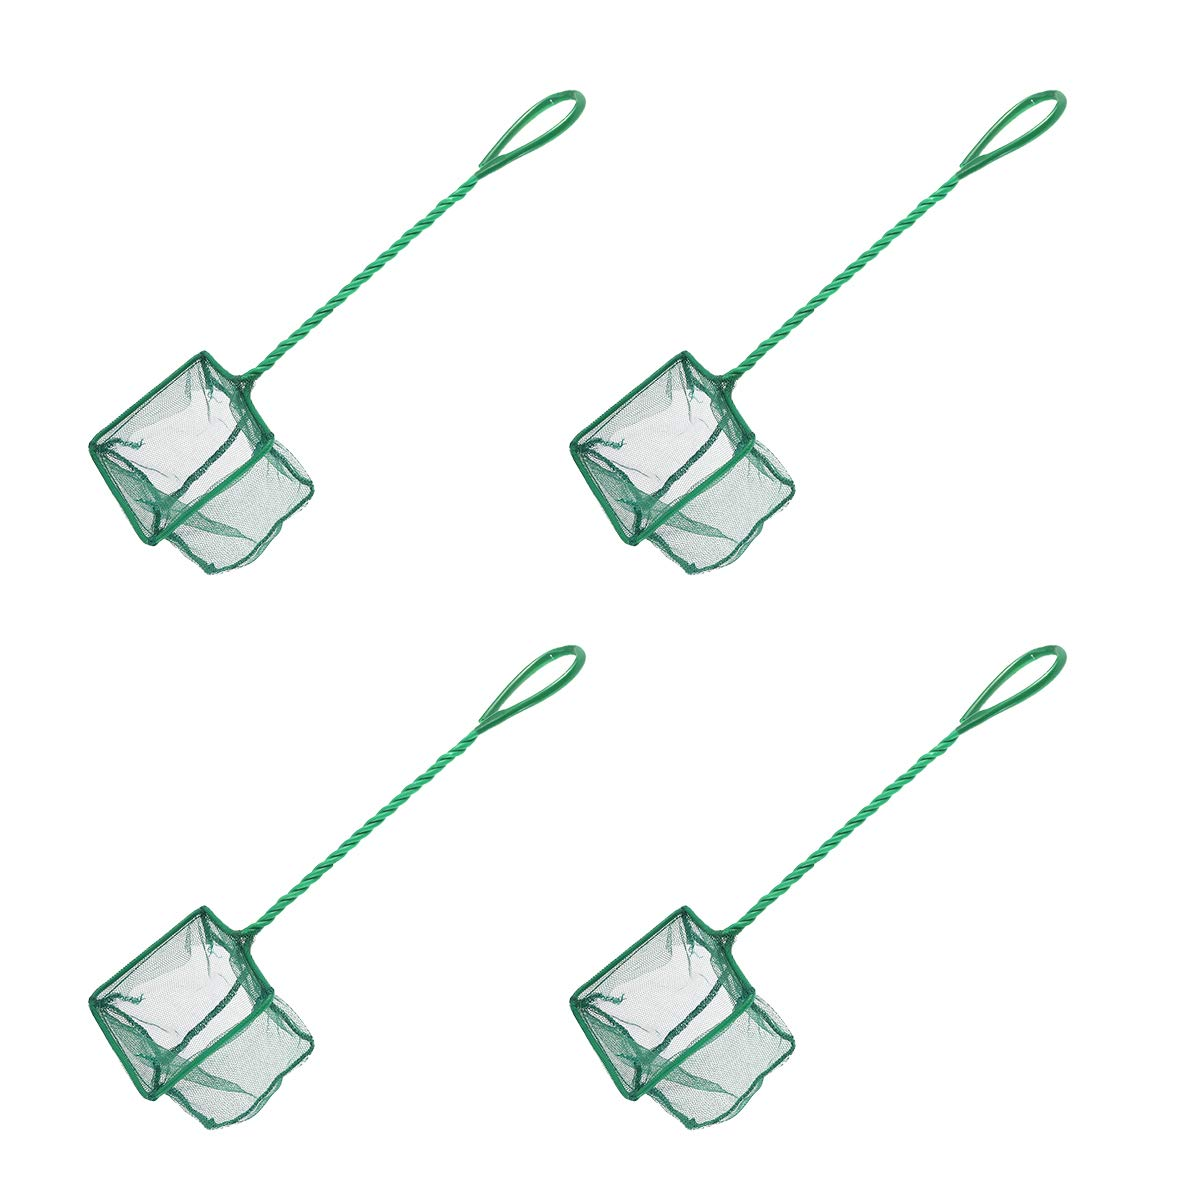 POPETPOP Portable Fishing Net Shrimp Dip Net with Handle for Aquarium Fish Tank Pond 4 Inch 4pcs Green